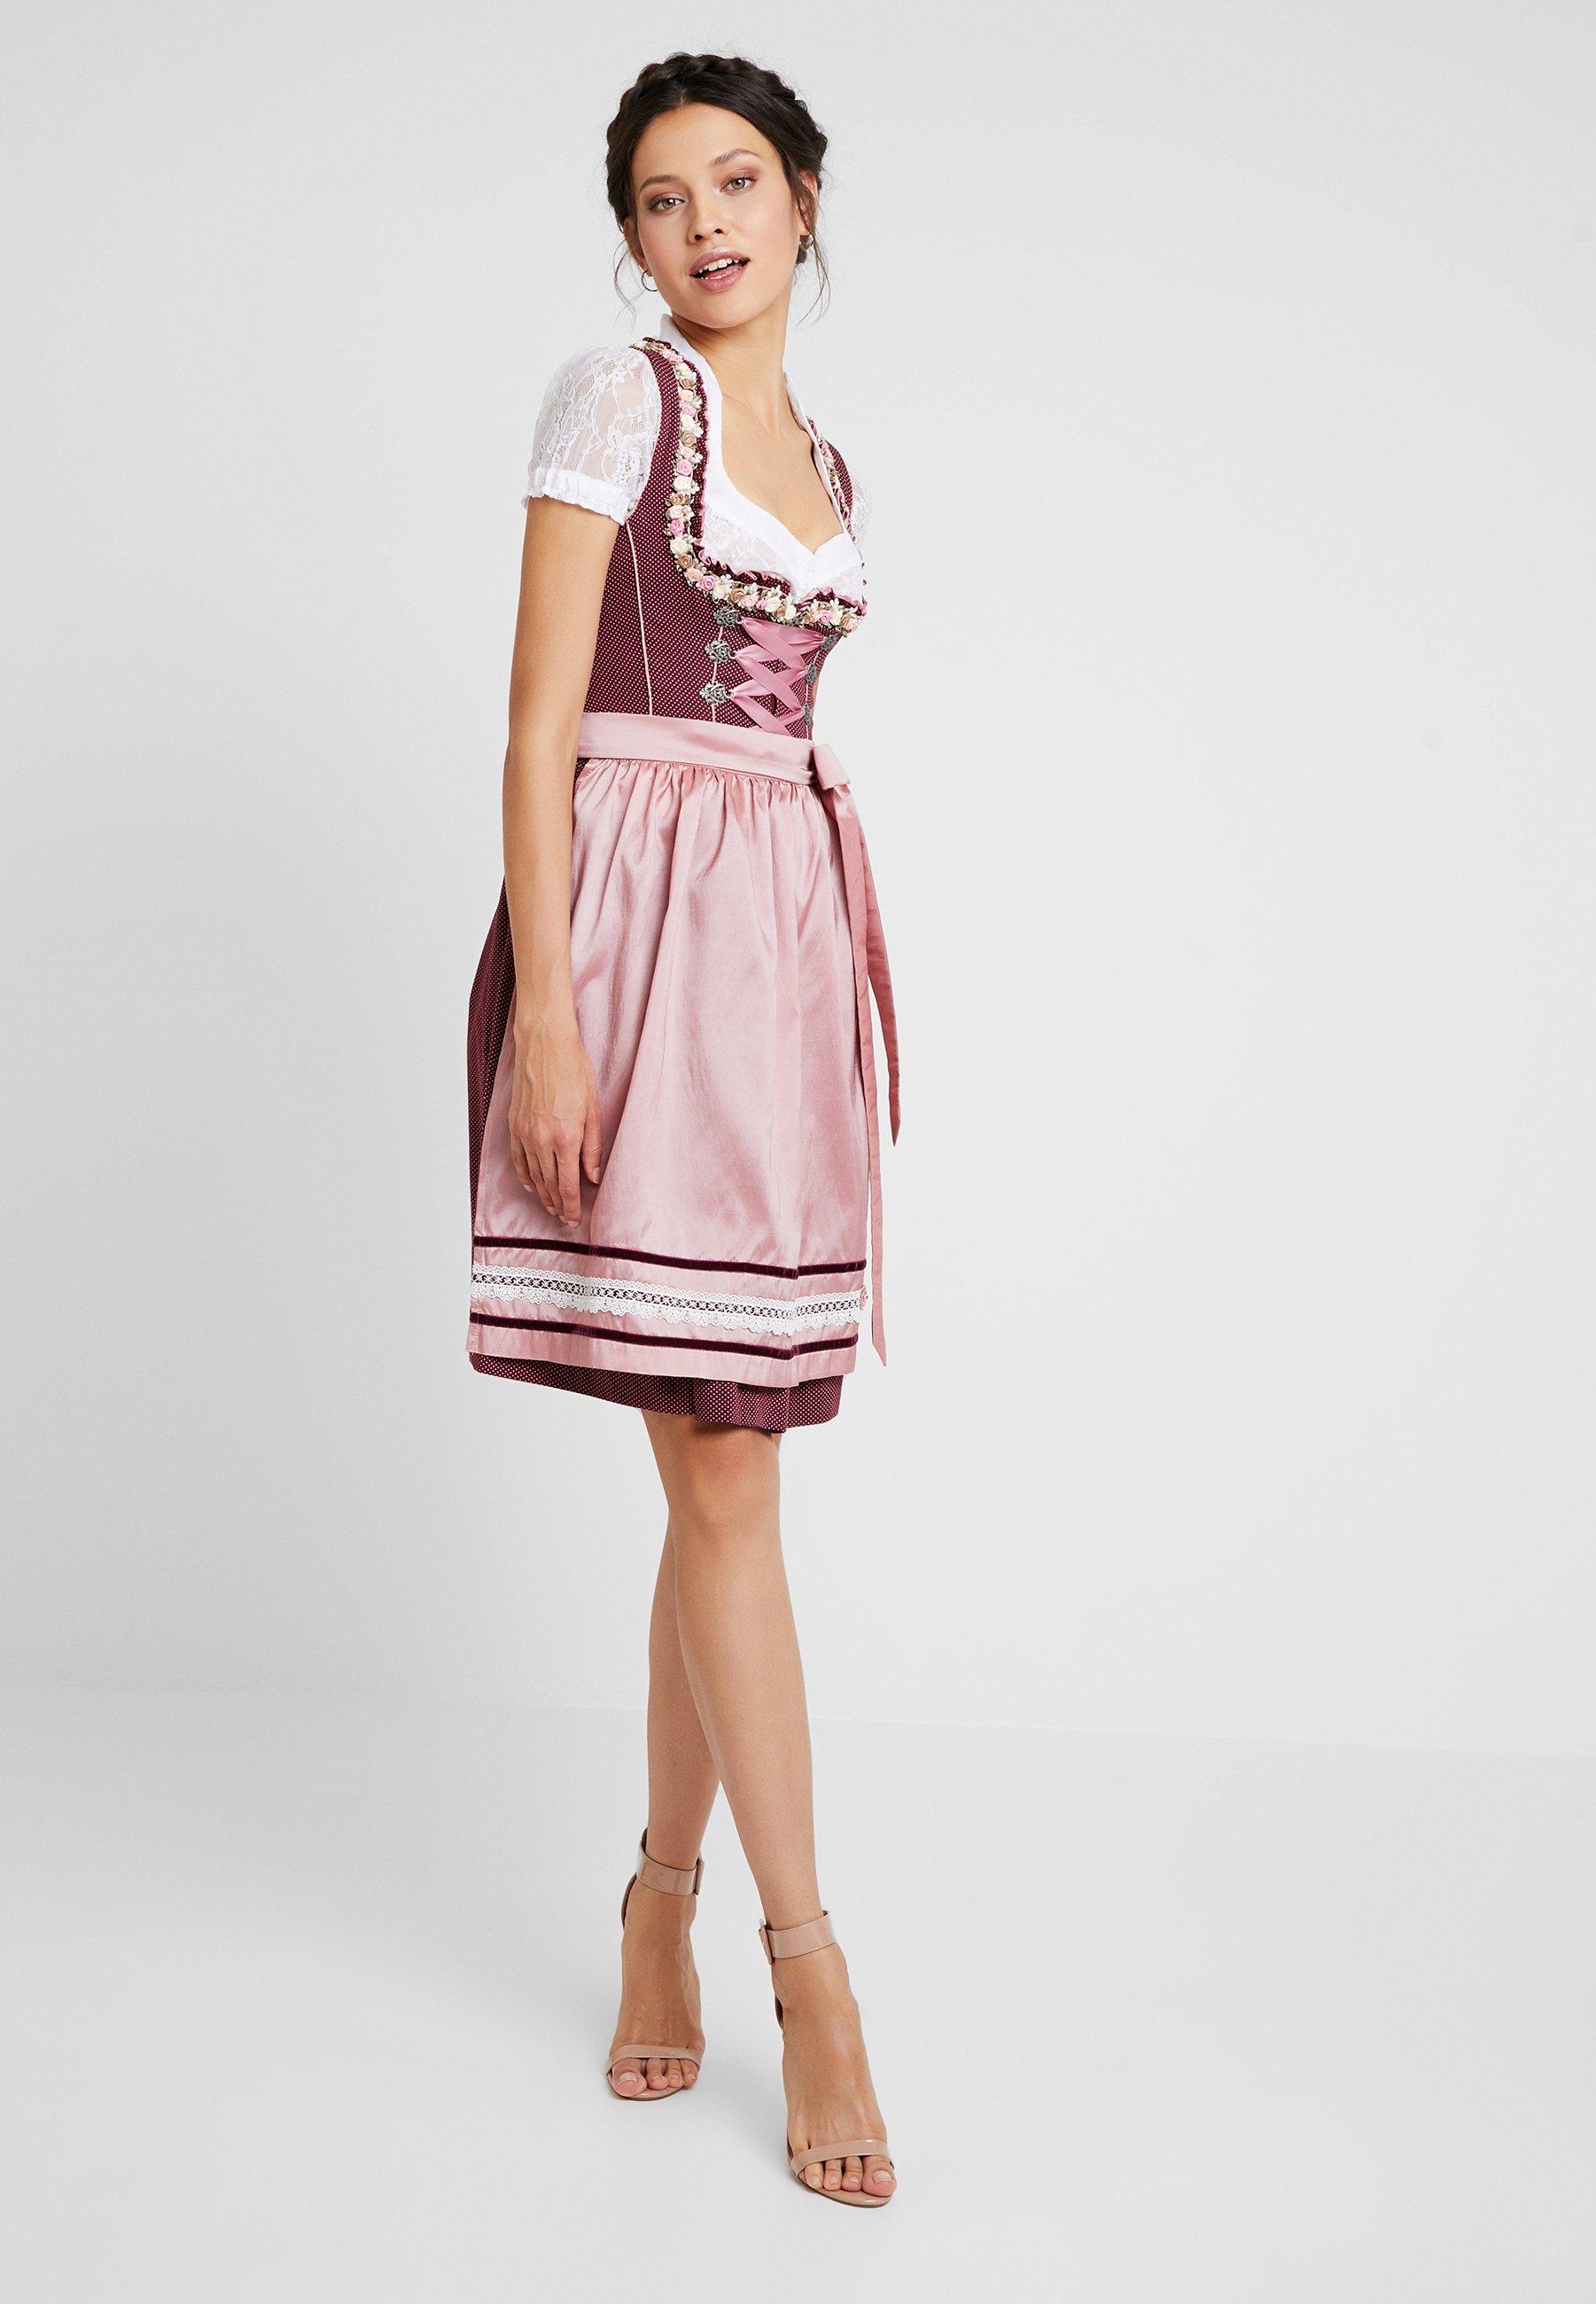 FIRMON Robe Barmaid Dirndl pour Femme Grande Taille